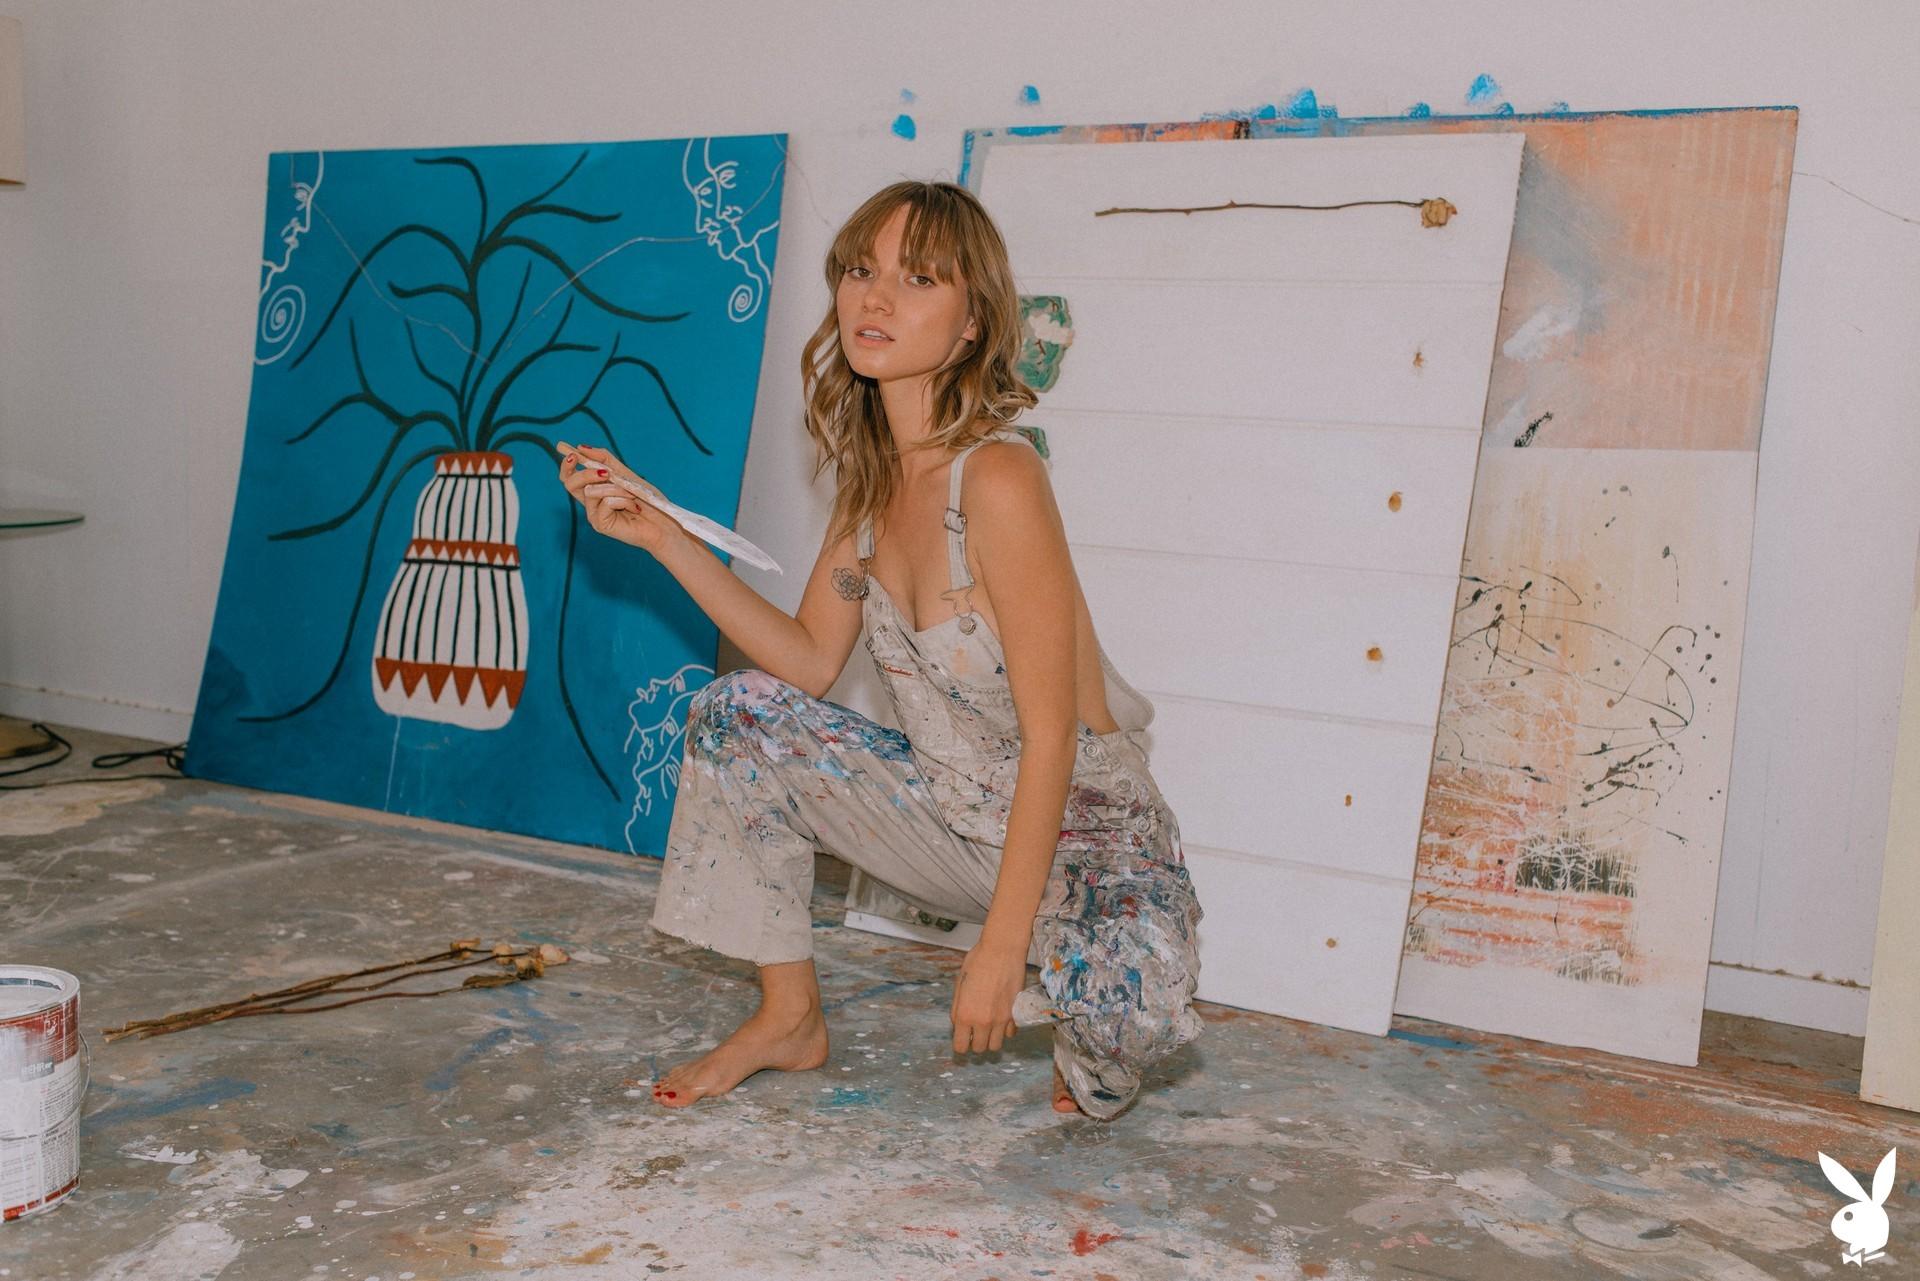 Nastasia Celeste In Creative Space Playboy Plus (2)